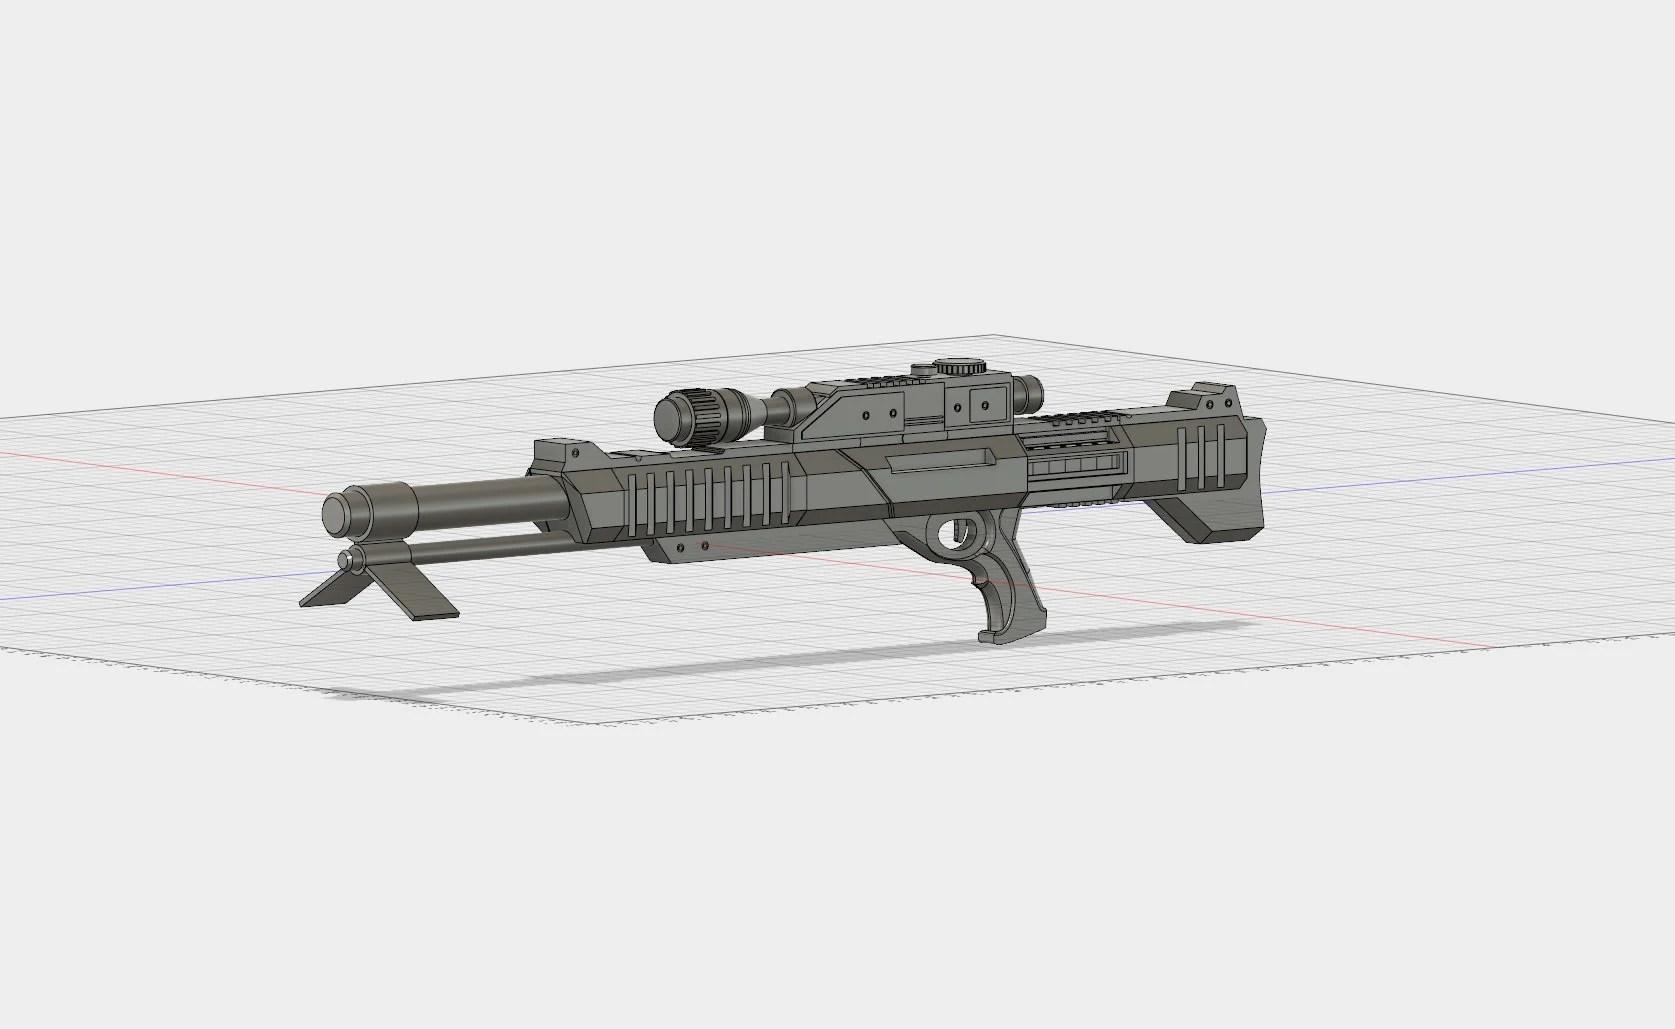 M98 Widow Maker sniper rifle 3D model 3D printable STL